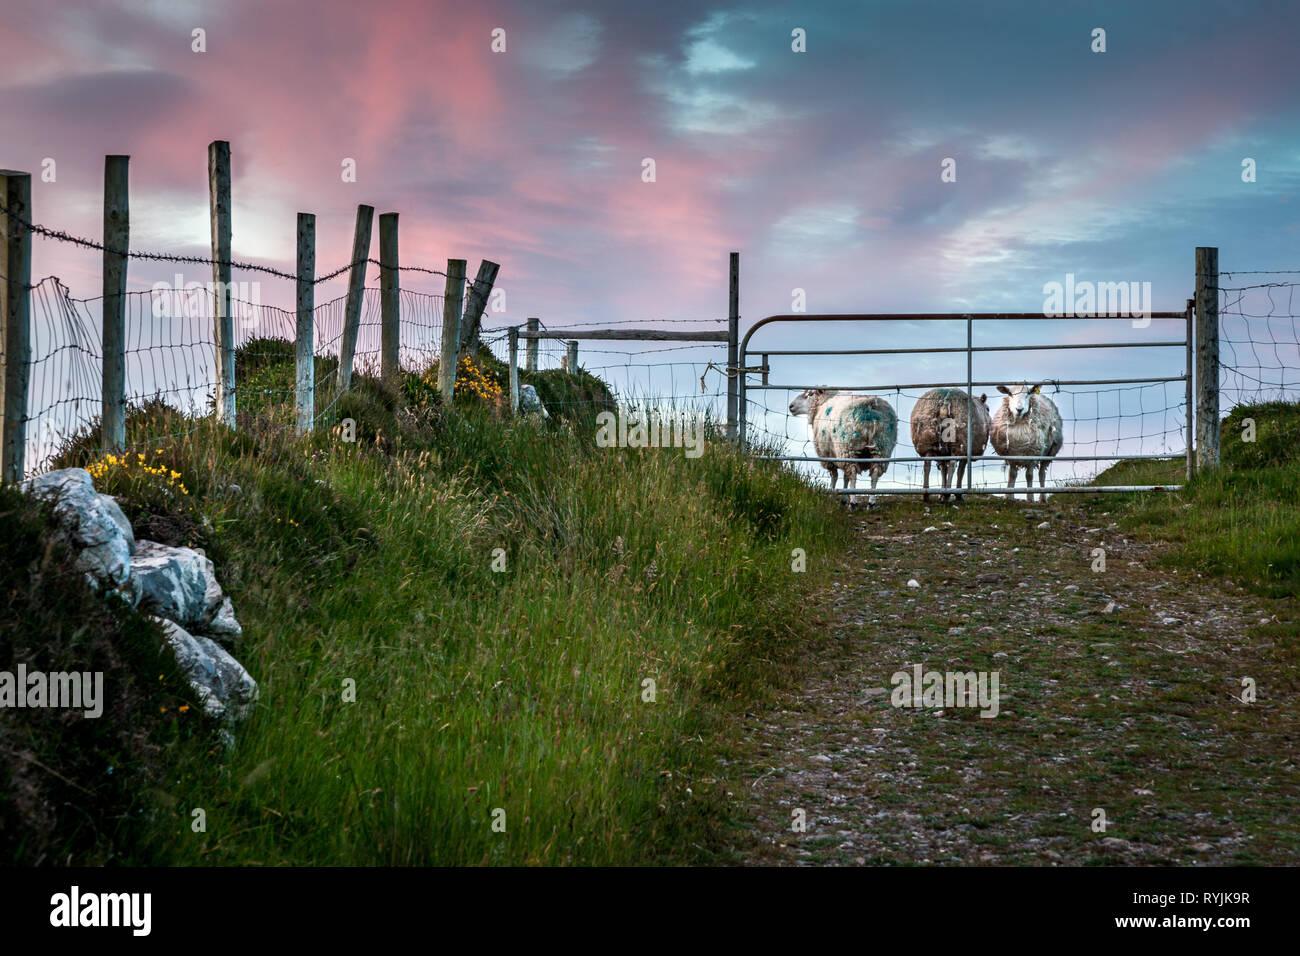 Dursey Island, Cork, Ireland. 18th June, 2016  Sheep behid a gate in the townland of Kilmichael on Dursey Island, Co. Cork, Ireland. - Stock Image